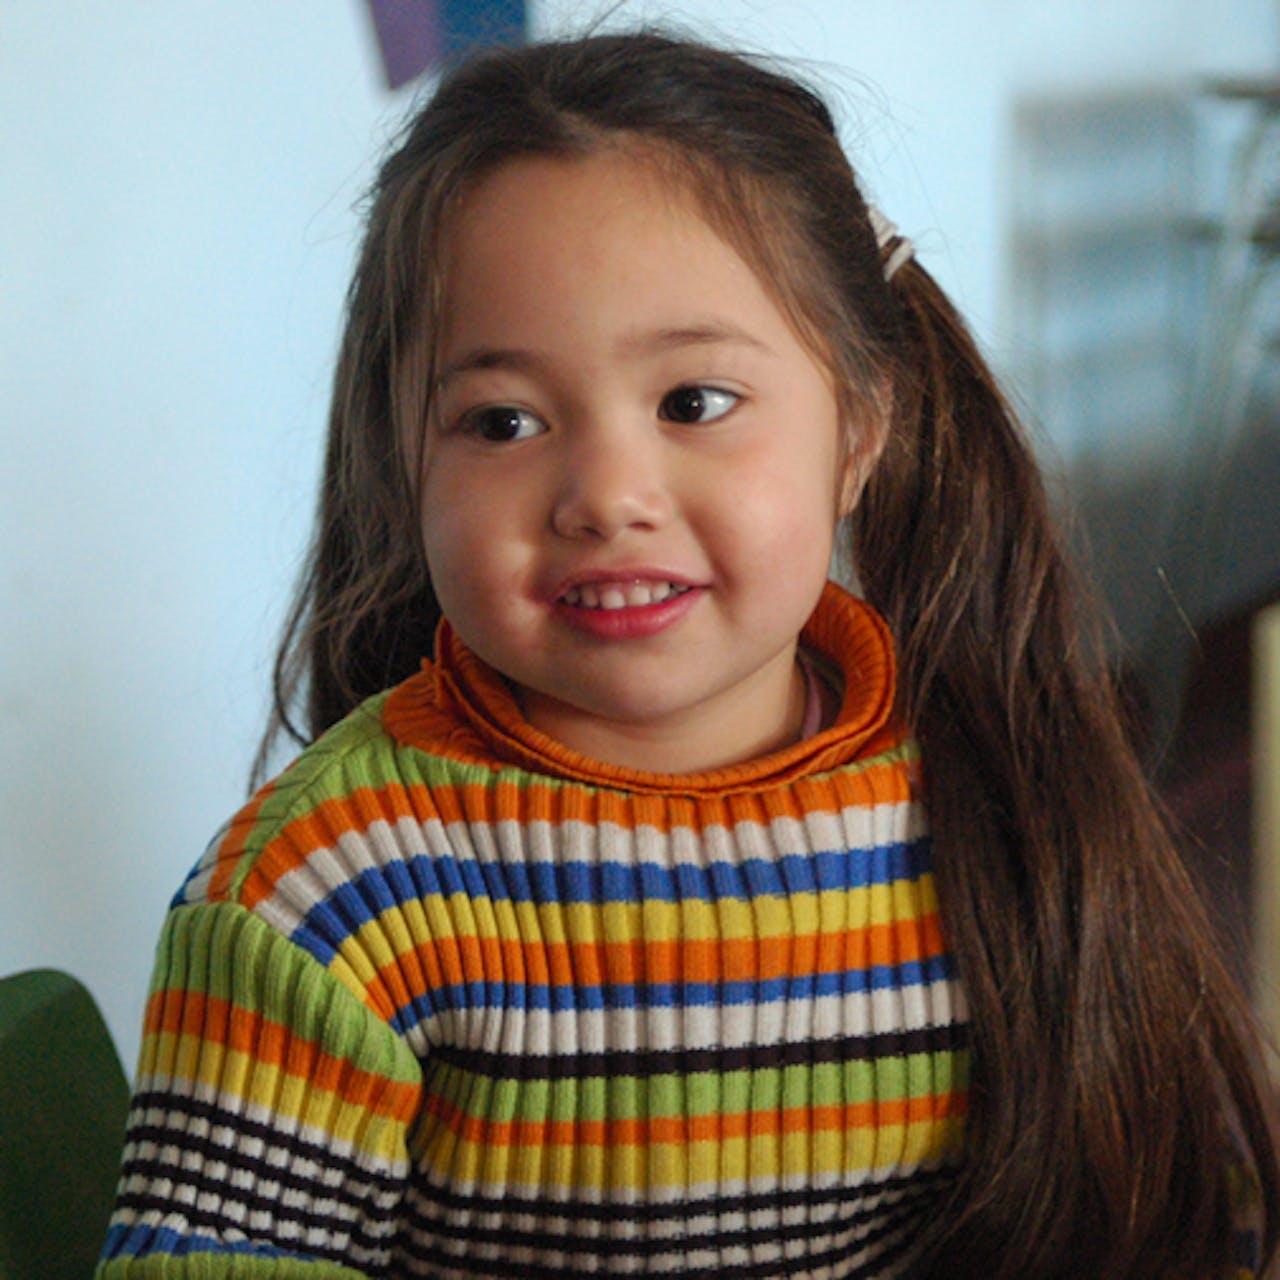 Meet the Children of Santiago, Chile